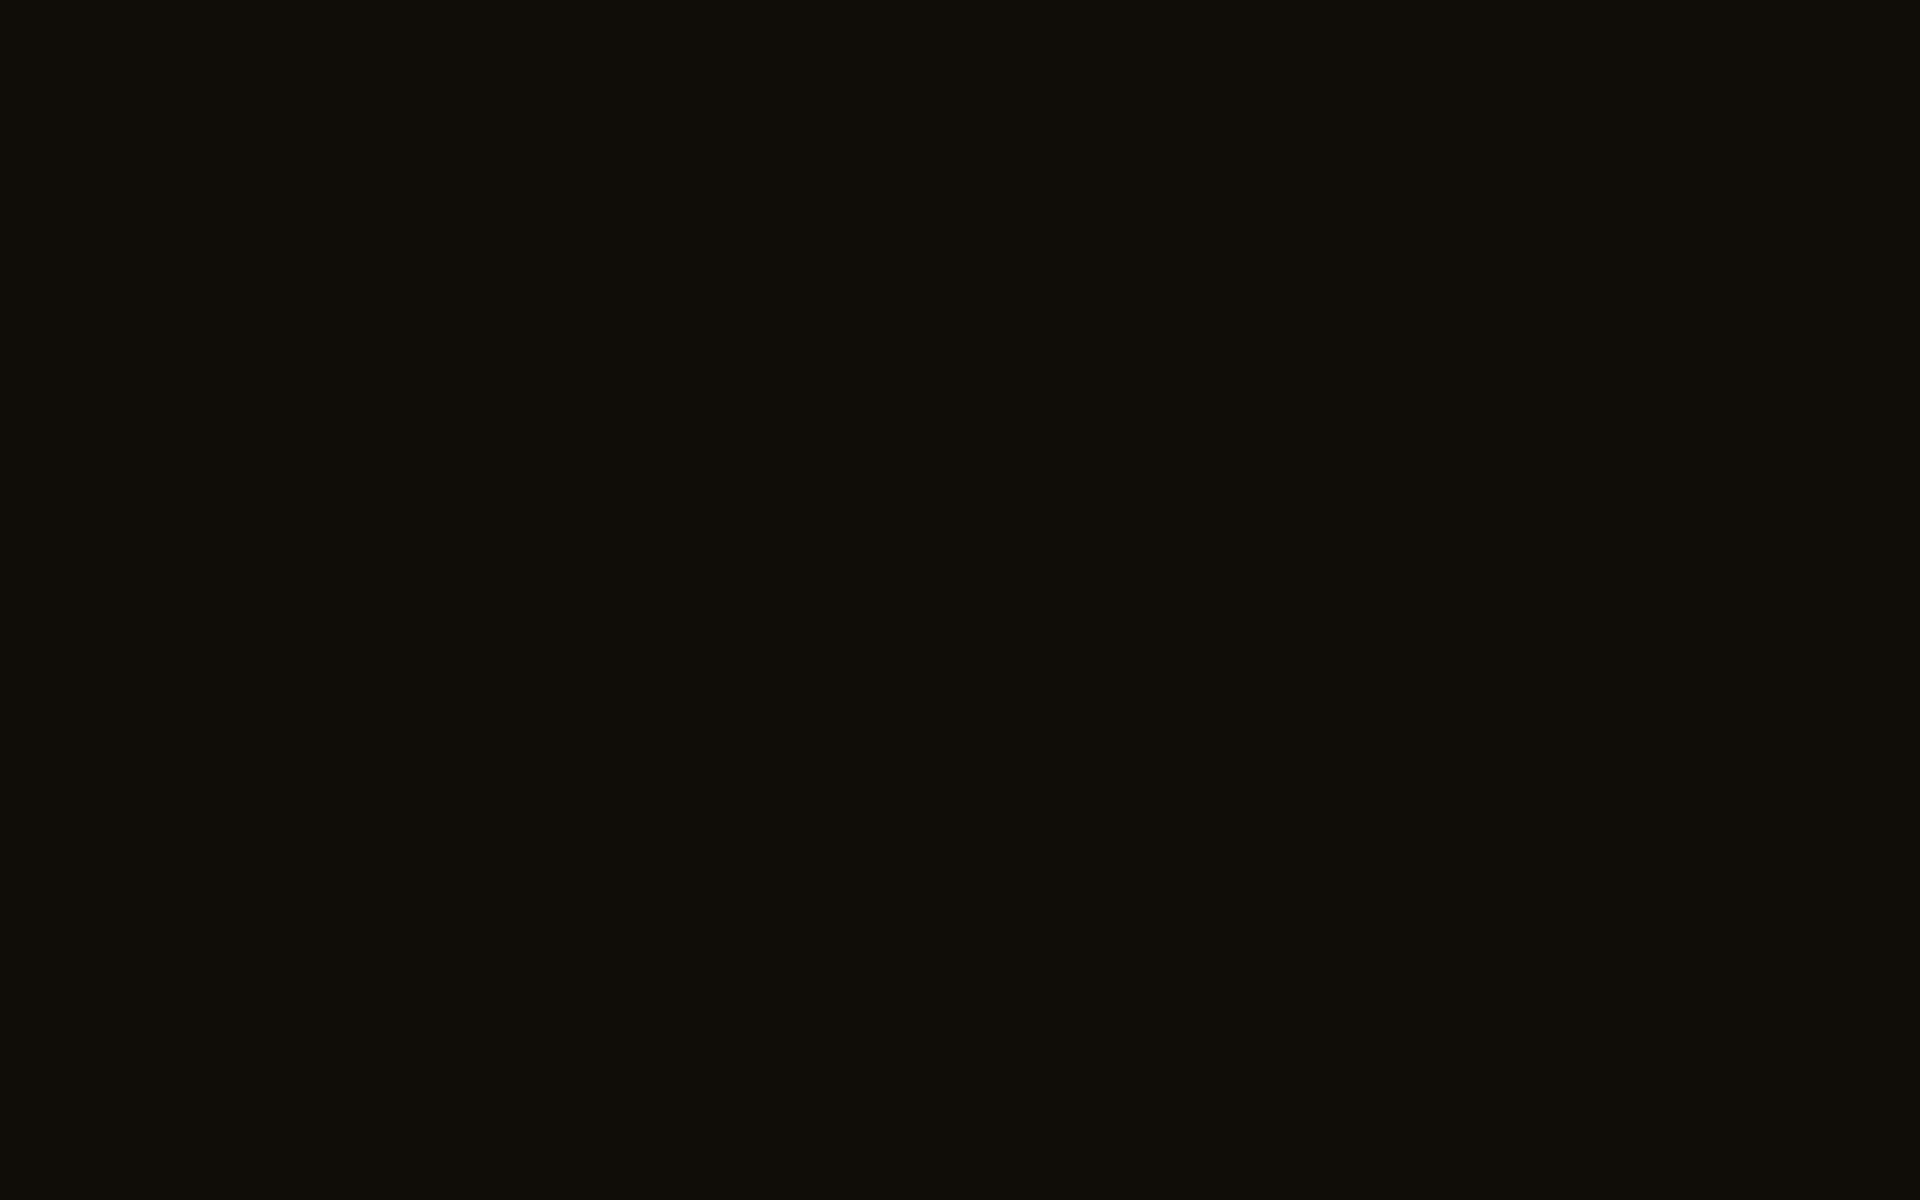 Solid Black Wallpaper | HD Wallpapers Plus